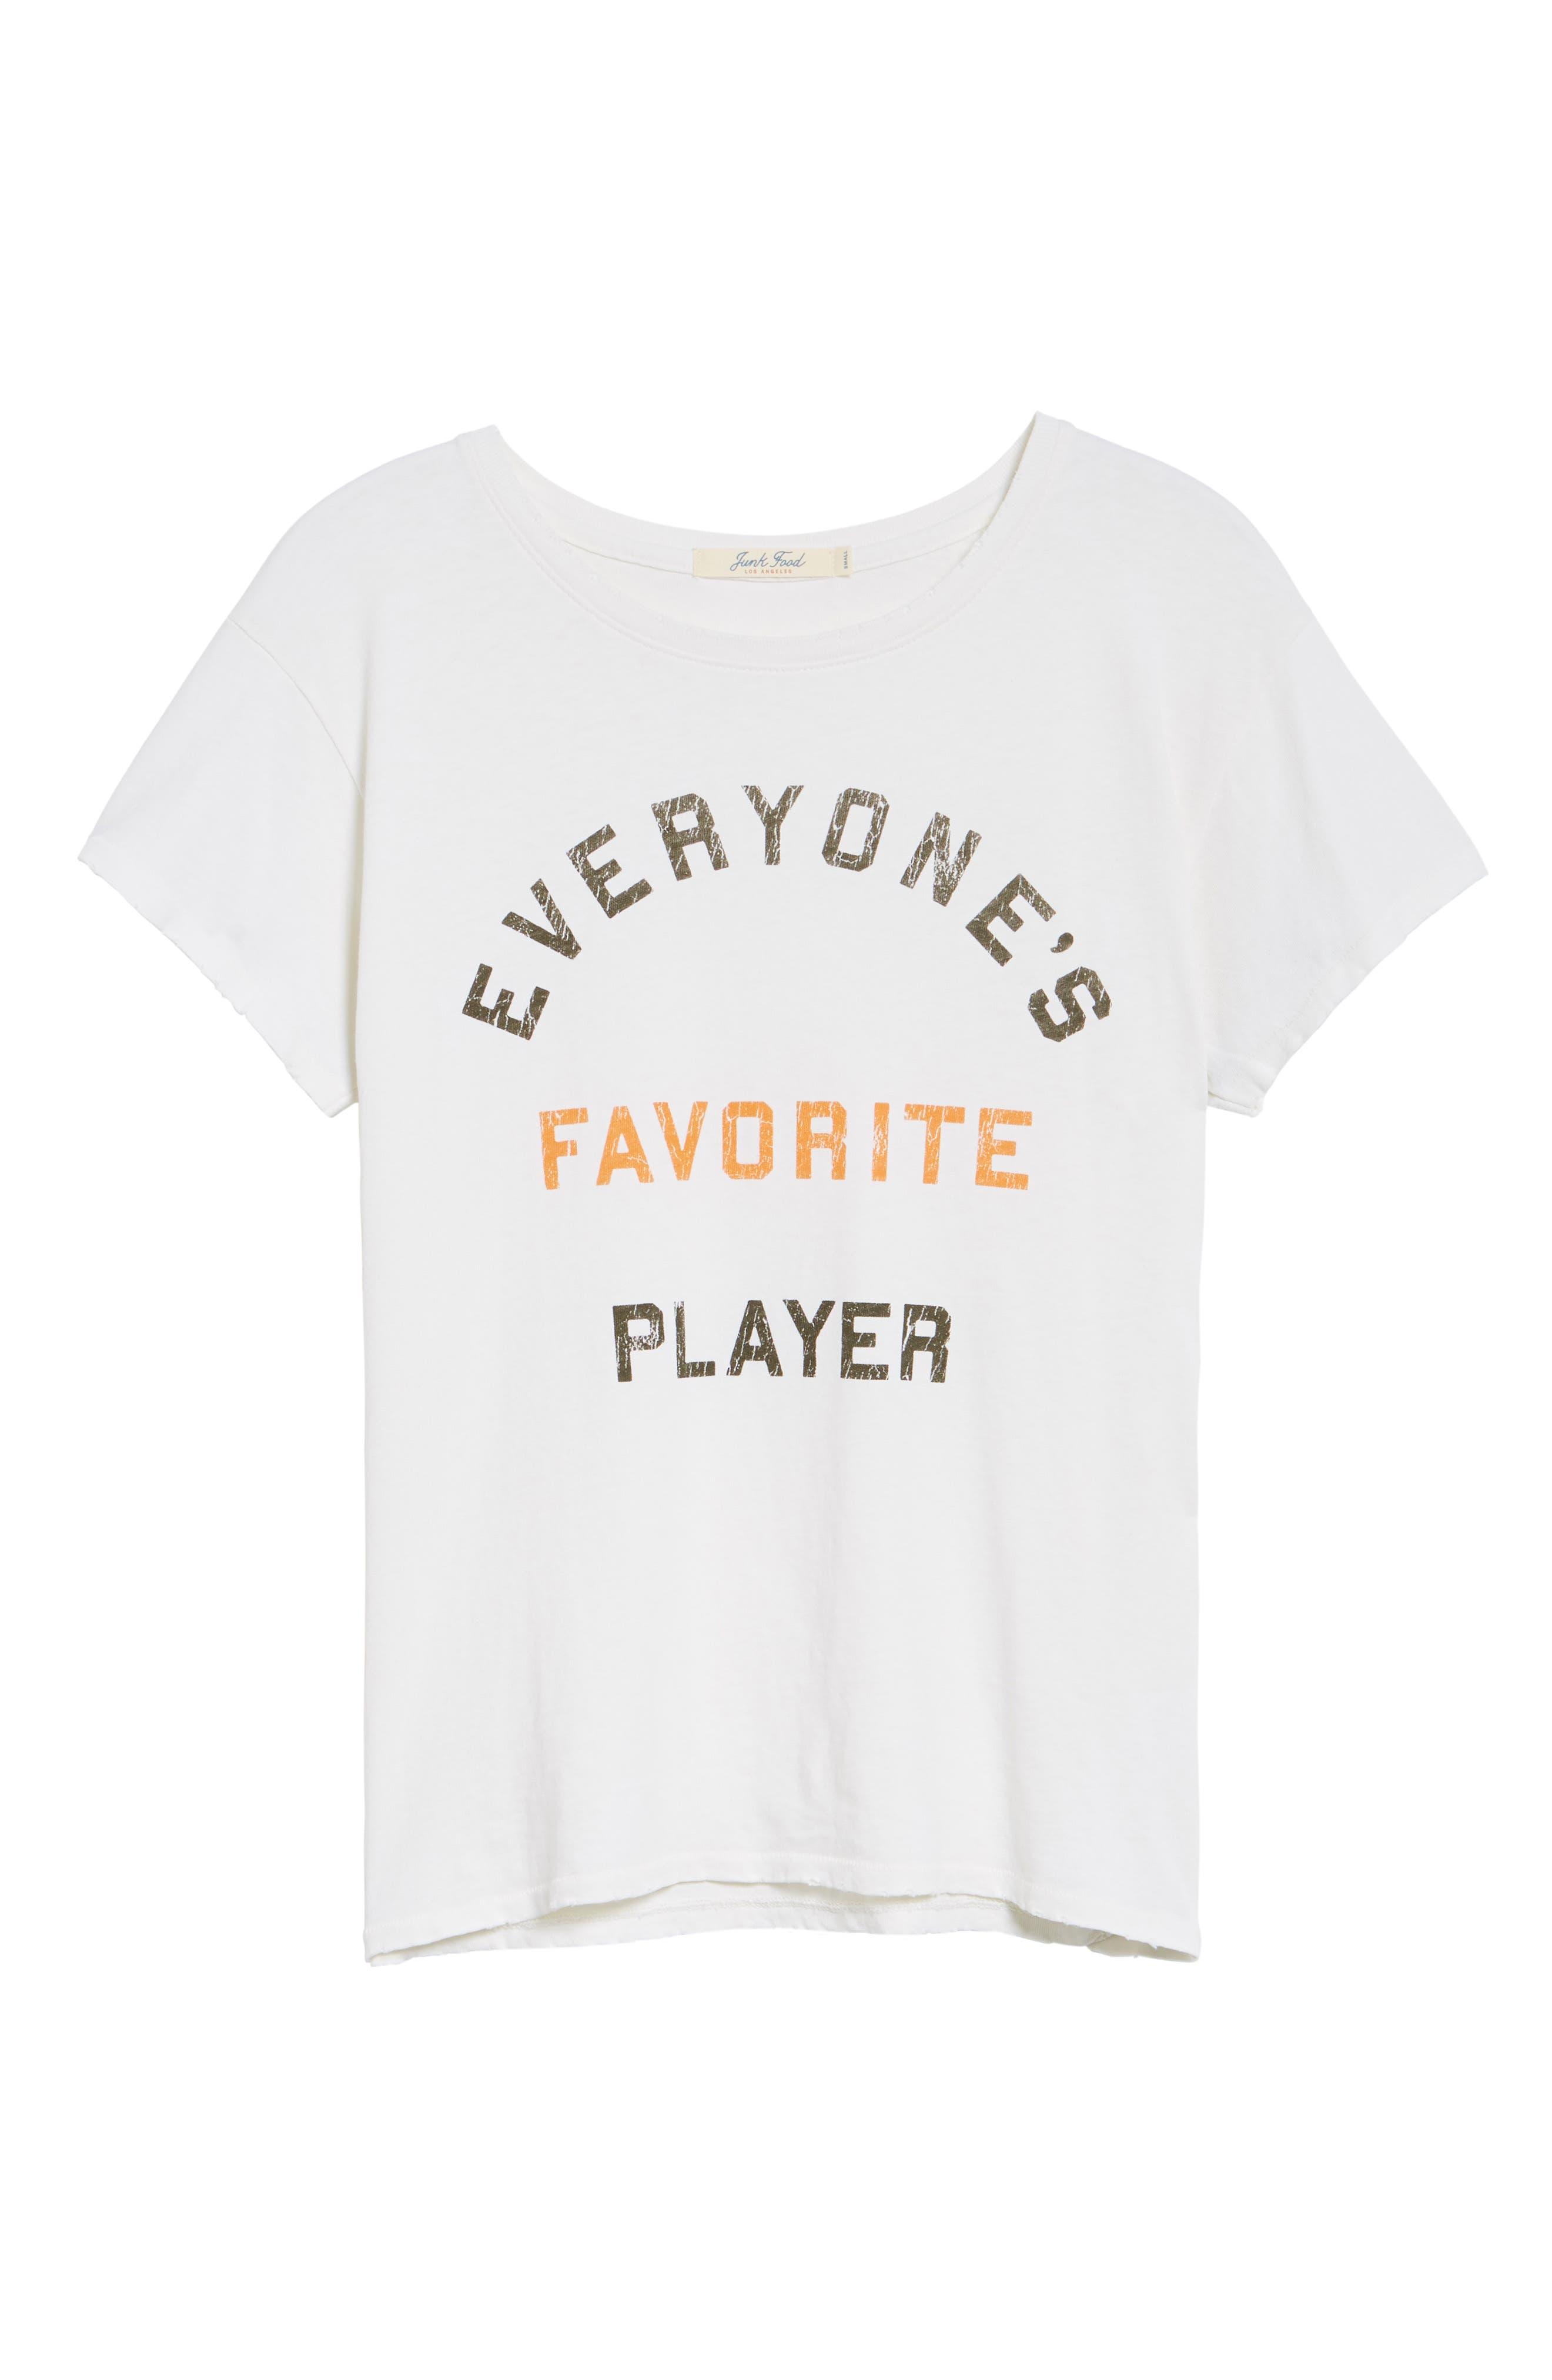 Everyone's Favorite Player Tee,                             Alternate thumbnail 7, color,                             VINTAGE WHITE ORANGE BLACK